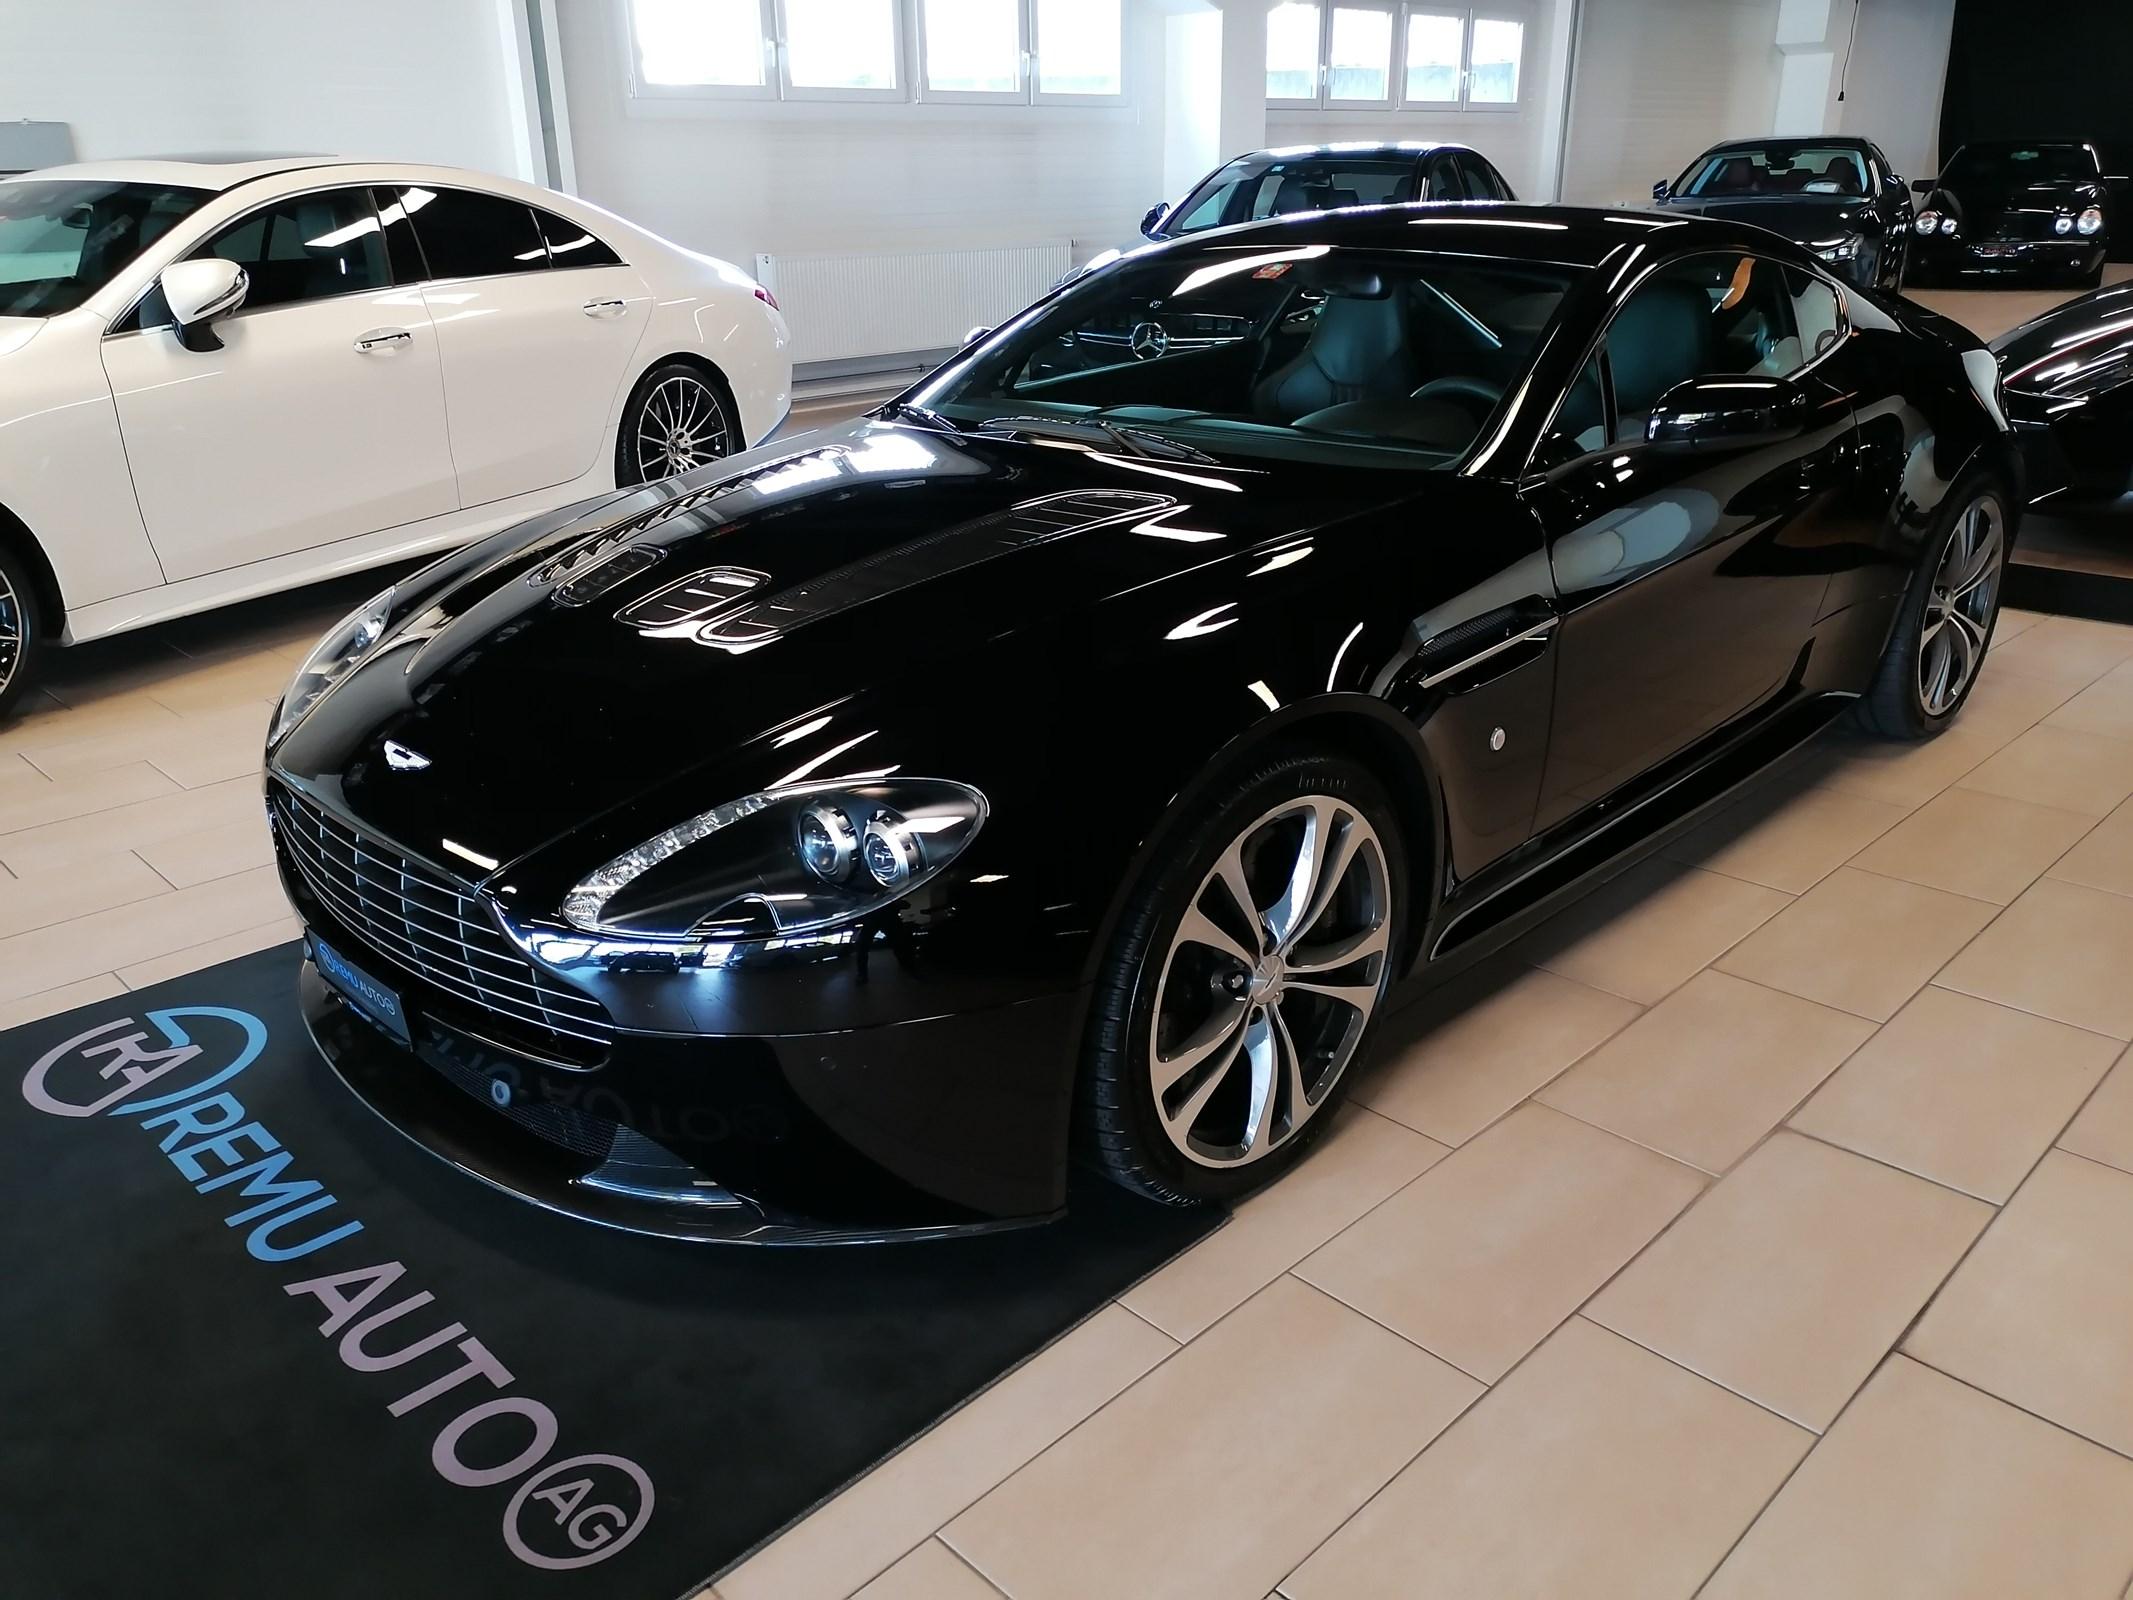 sportscar Aston Martin V8/V12 Vantage V12 Vantage 5.9 CH-Fahrzeug